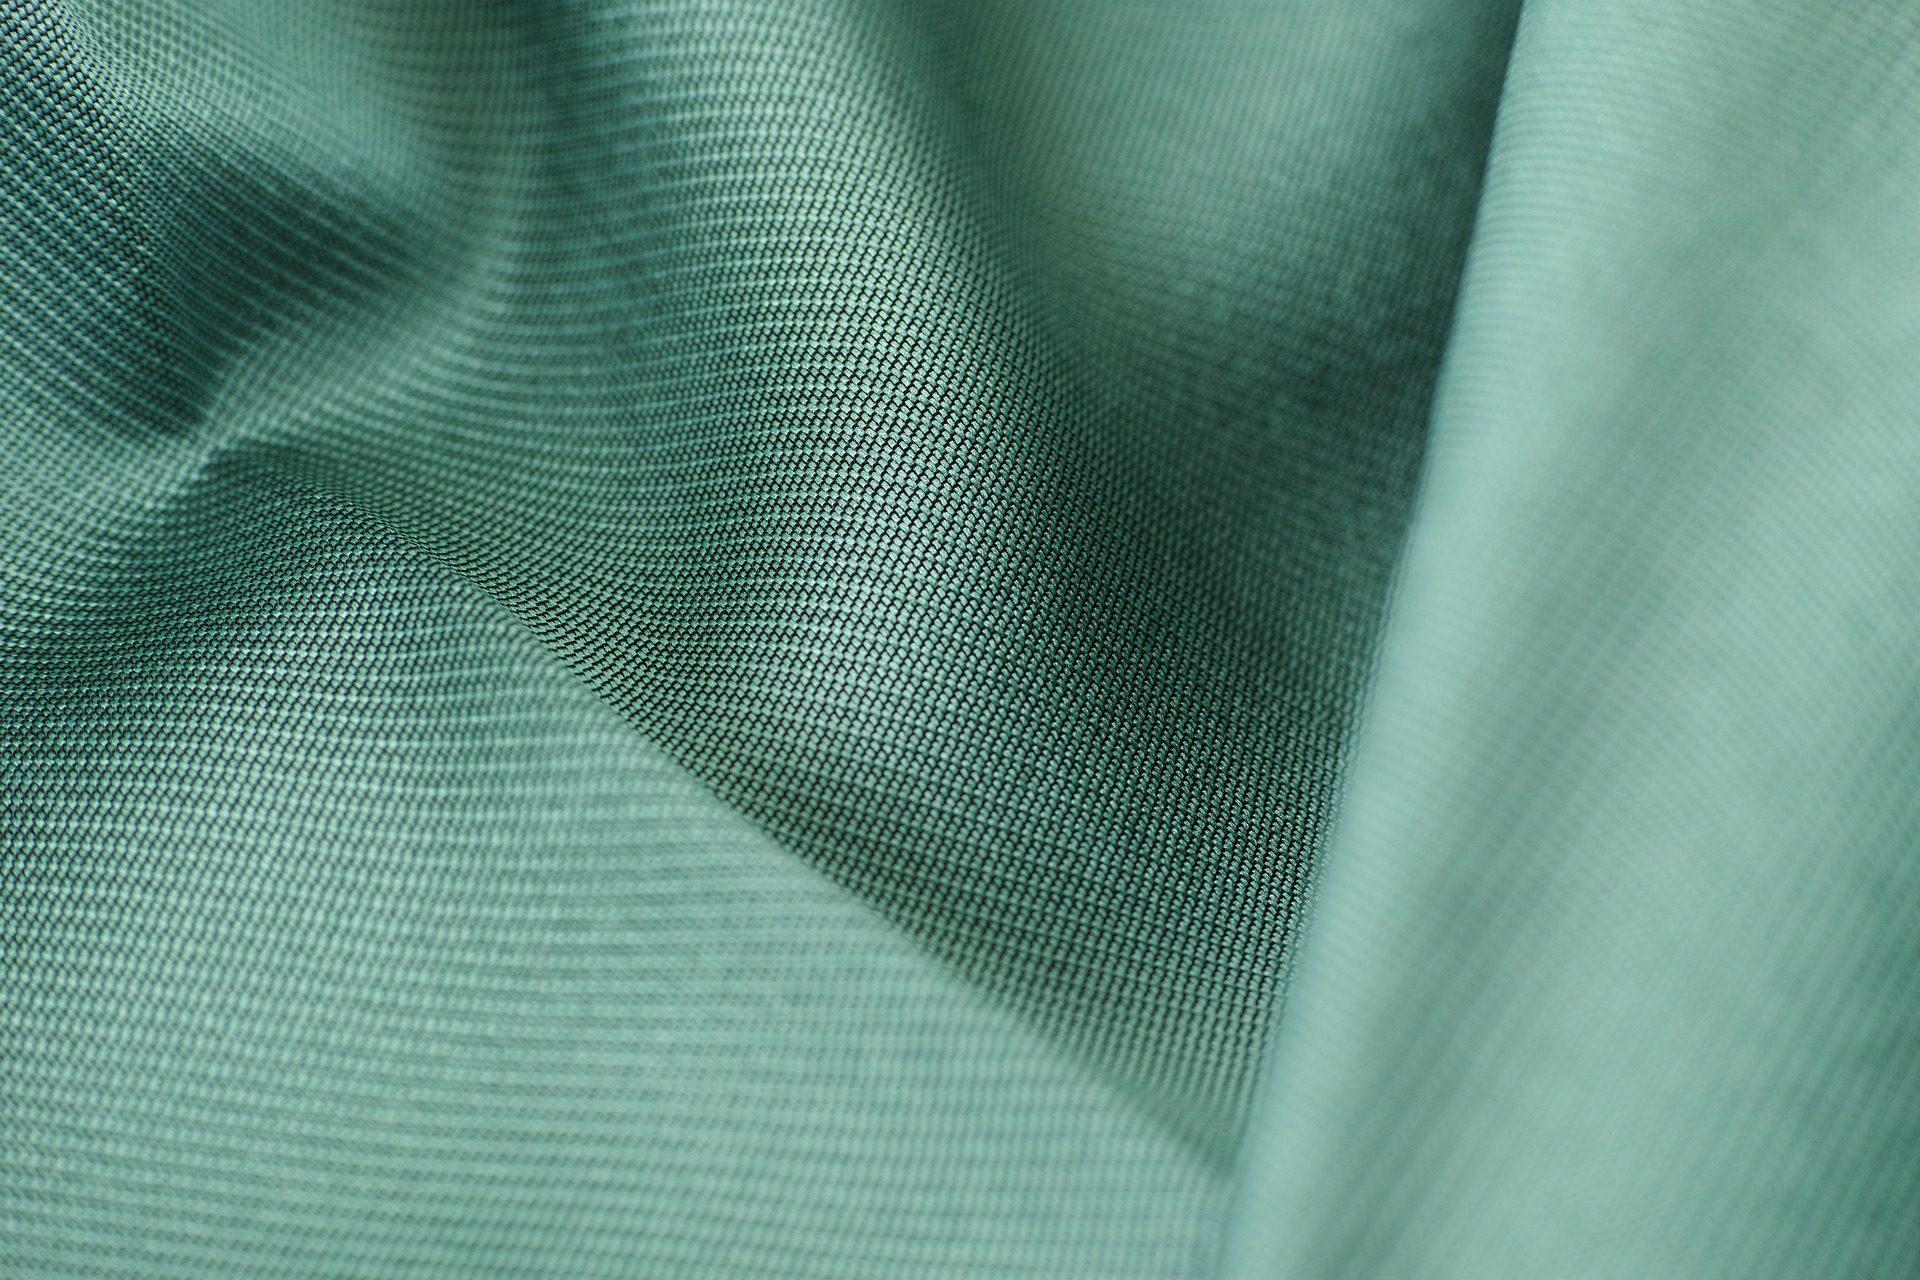 tela, ropa, pliegues, patrón, costuras - Fondos de Pantalla HD - professor-falken.com